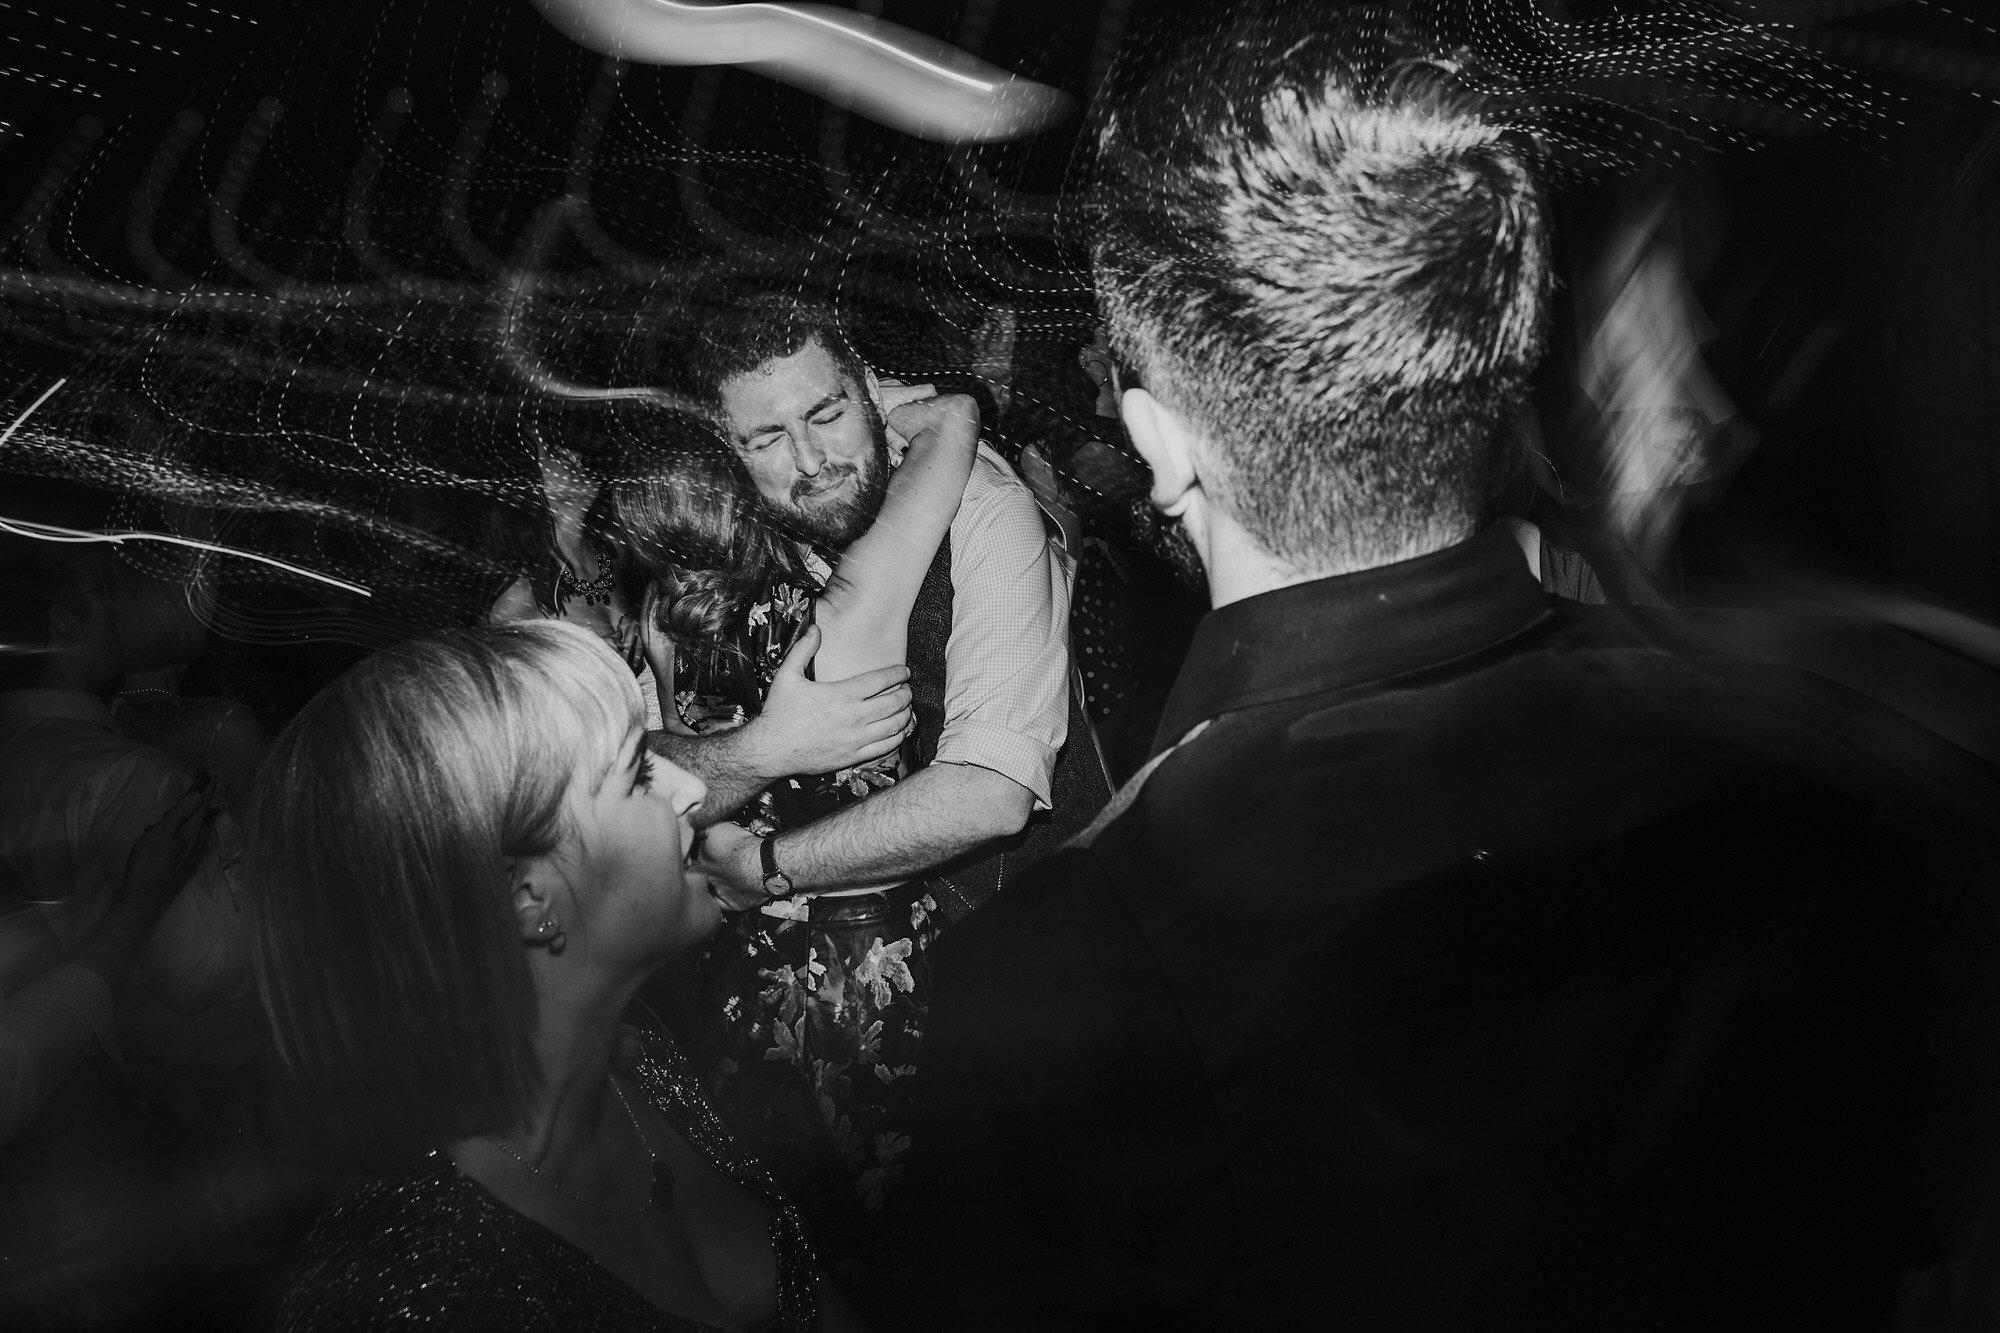 084 TIN SHED KNOCKRAICH FARM WEDDING ALTERNATIVE BRIDE ZOE ALEXANDRA PHOTOGRAPHY